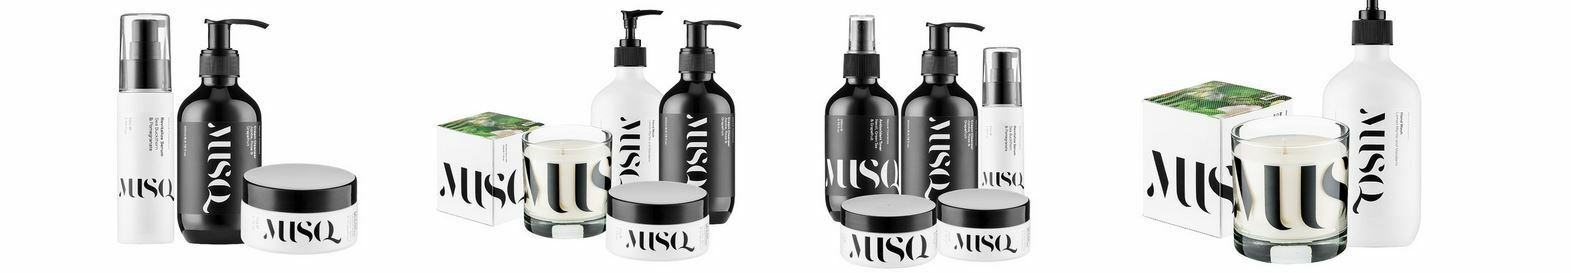 Musq - Aus Made Natural Cosmetics